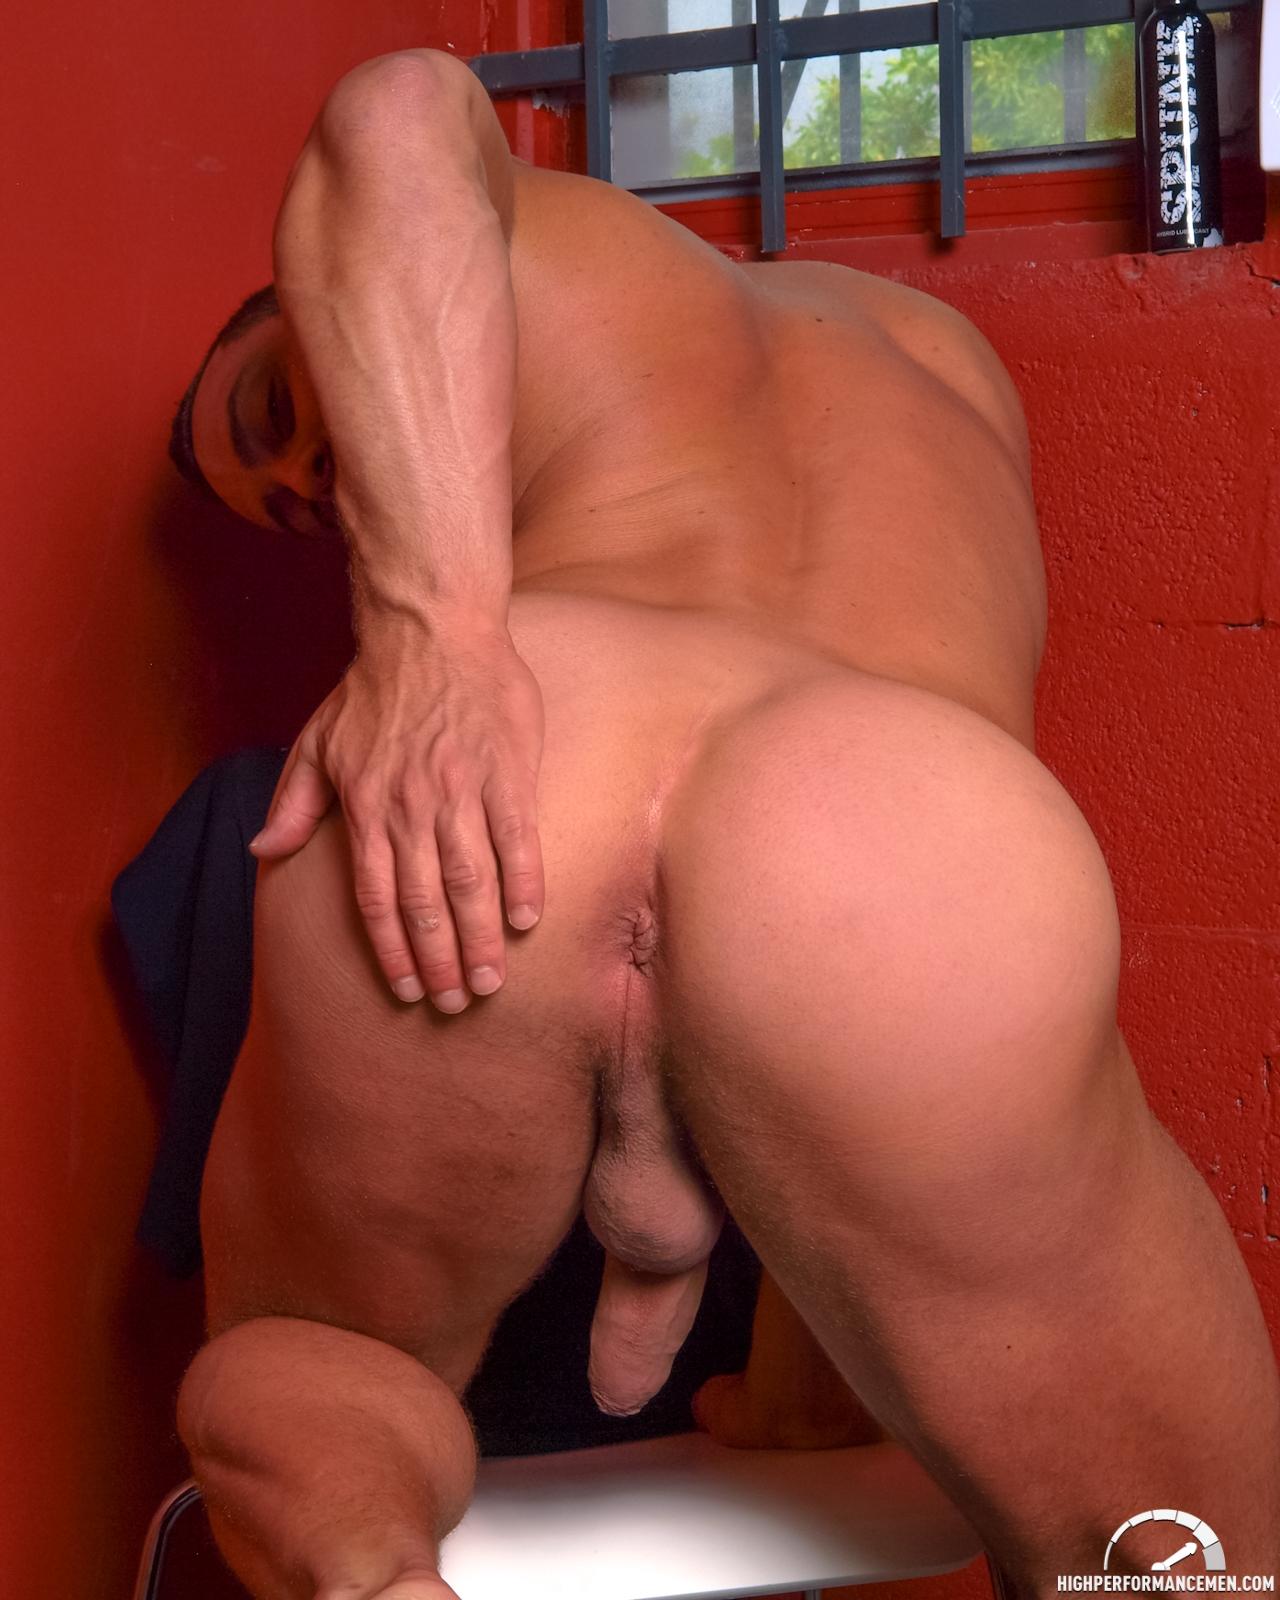 free downloadable gay porn videos